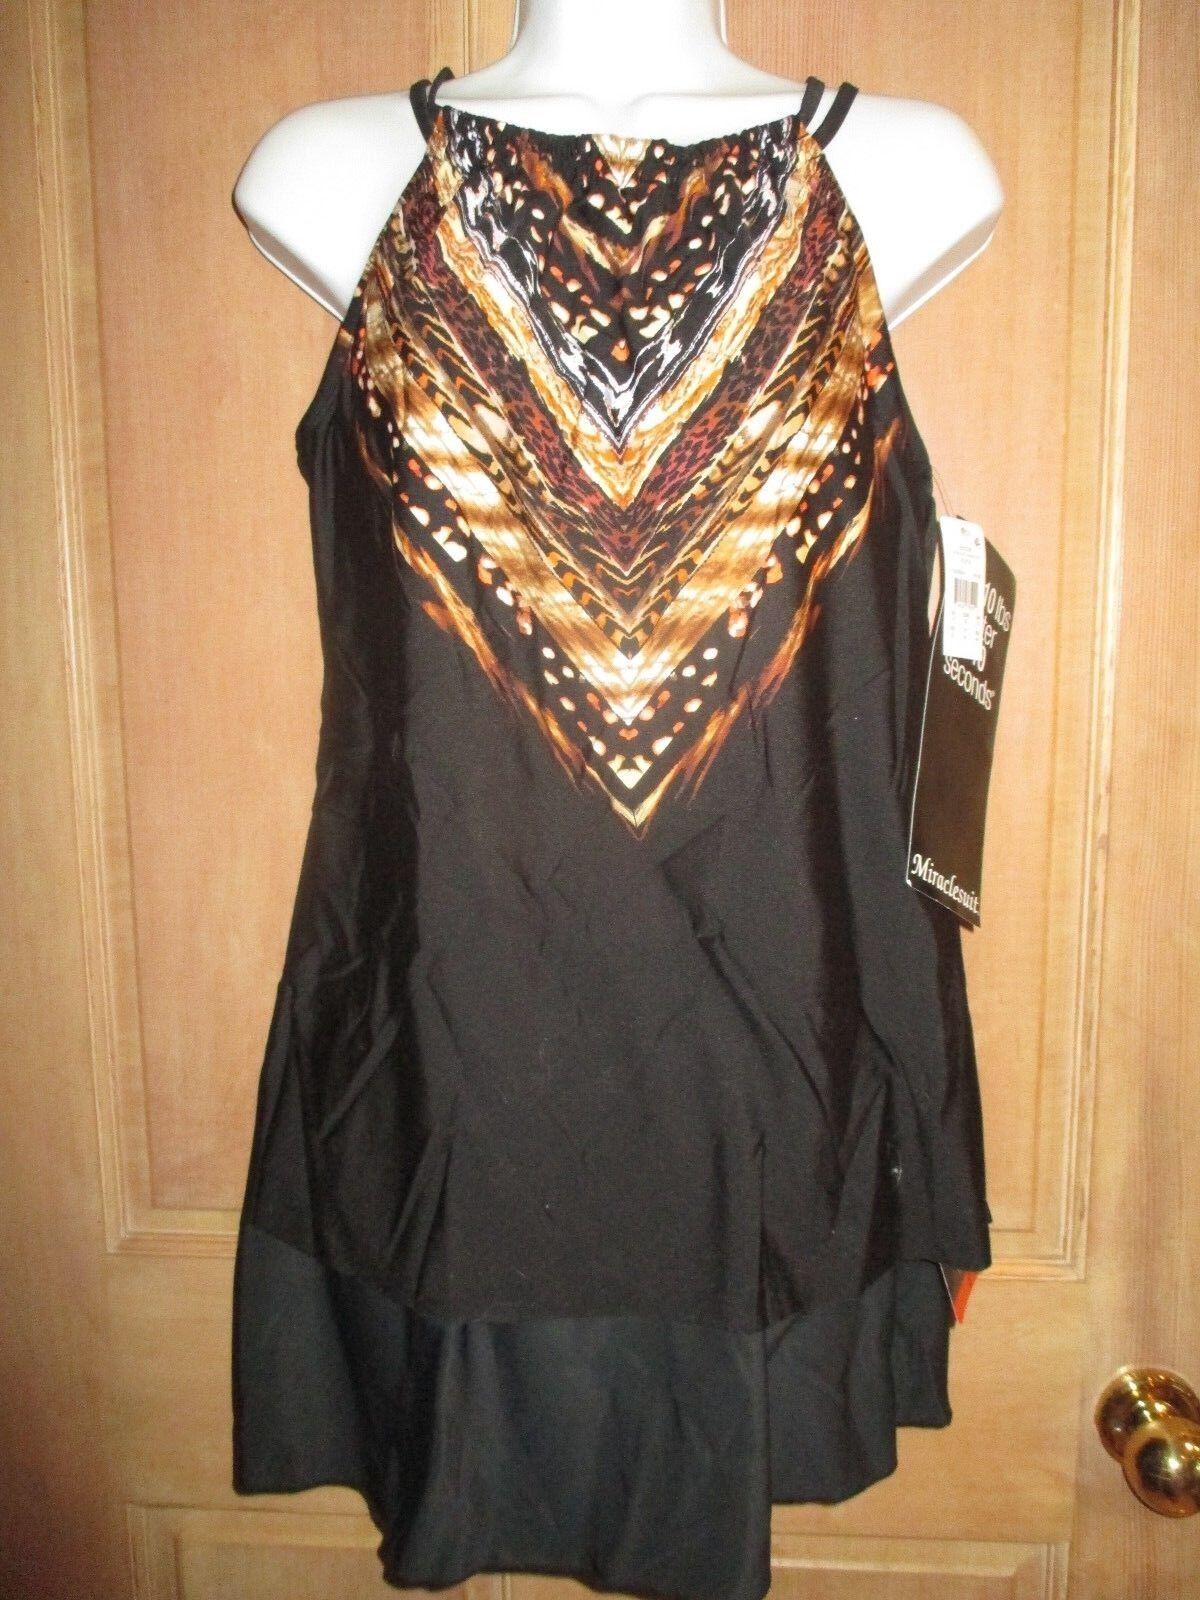 New Magicsuit Miraclesuit Tankini 8 38 Shoreline Swimsuit 2 Piece Skirt